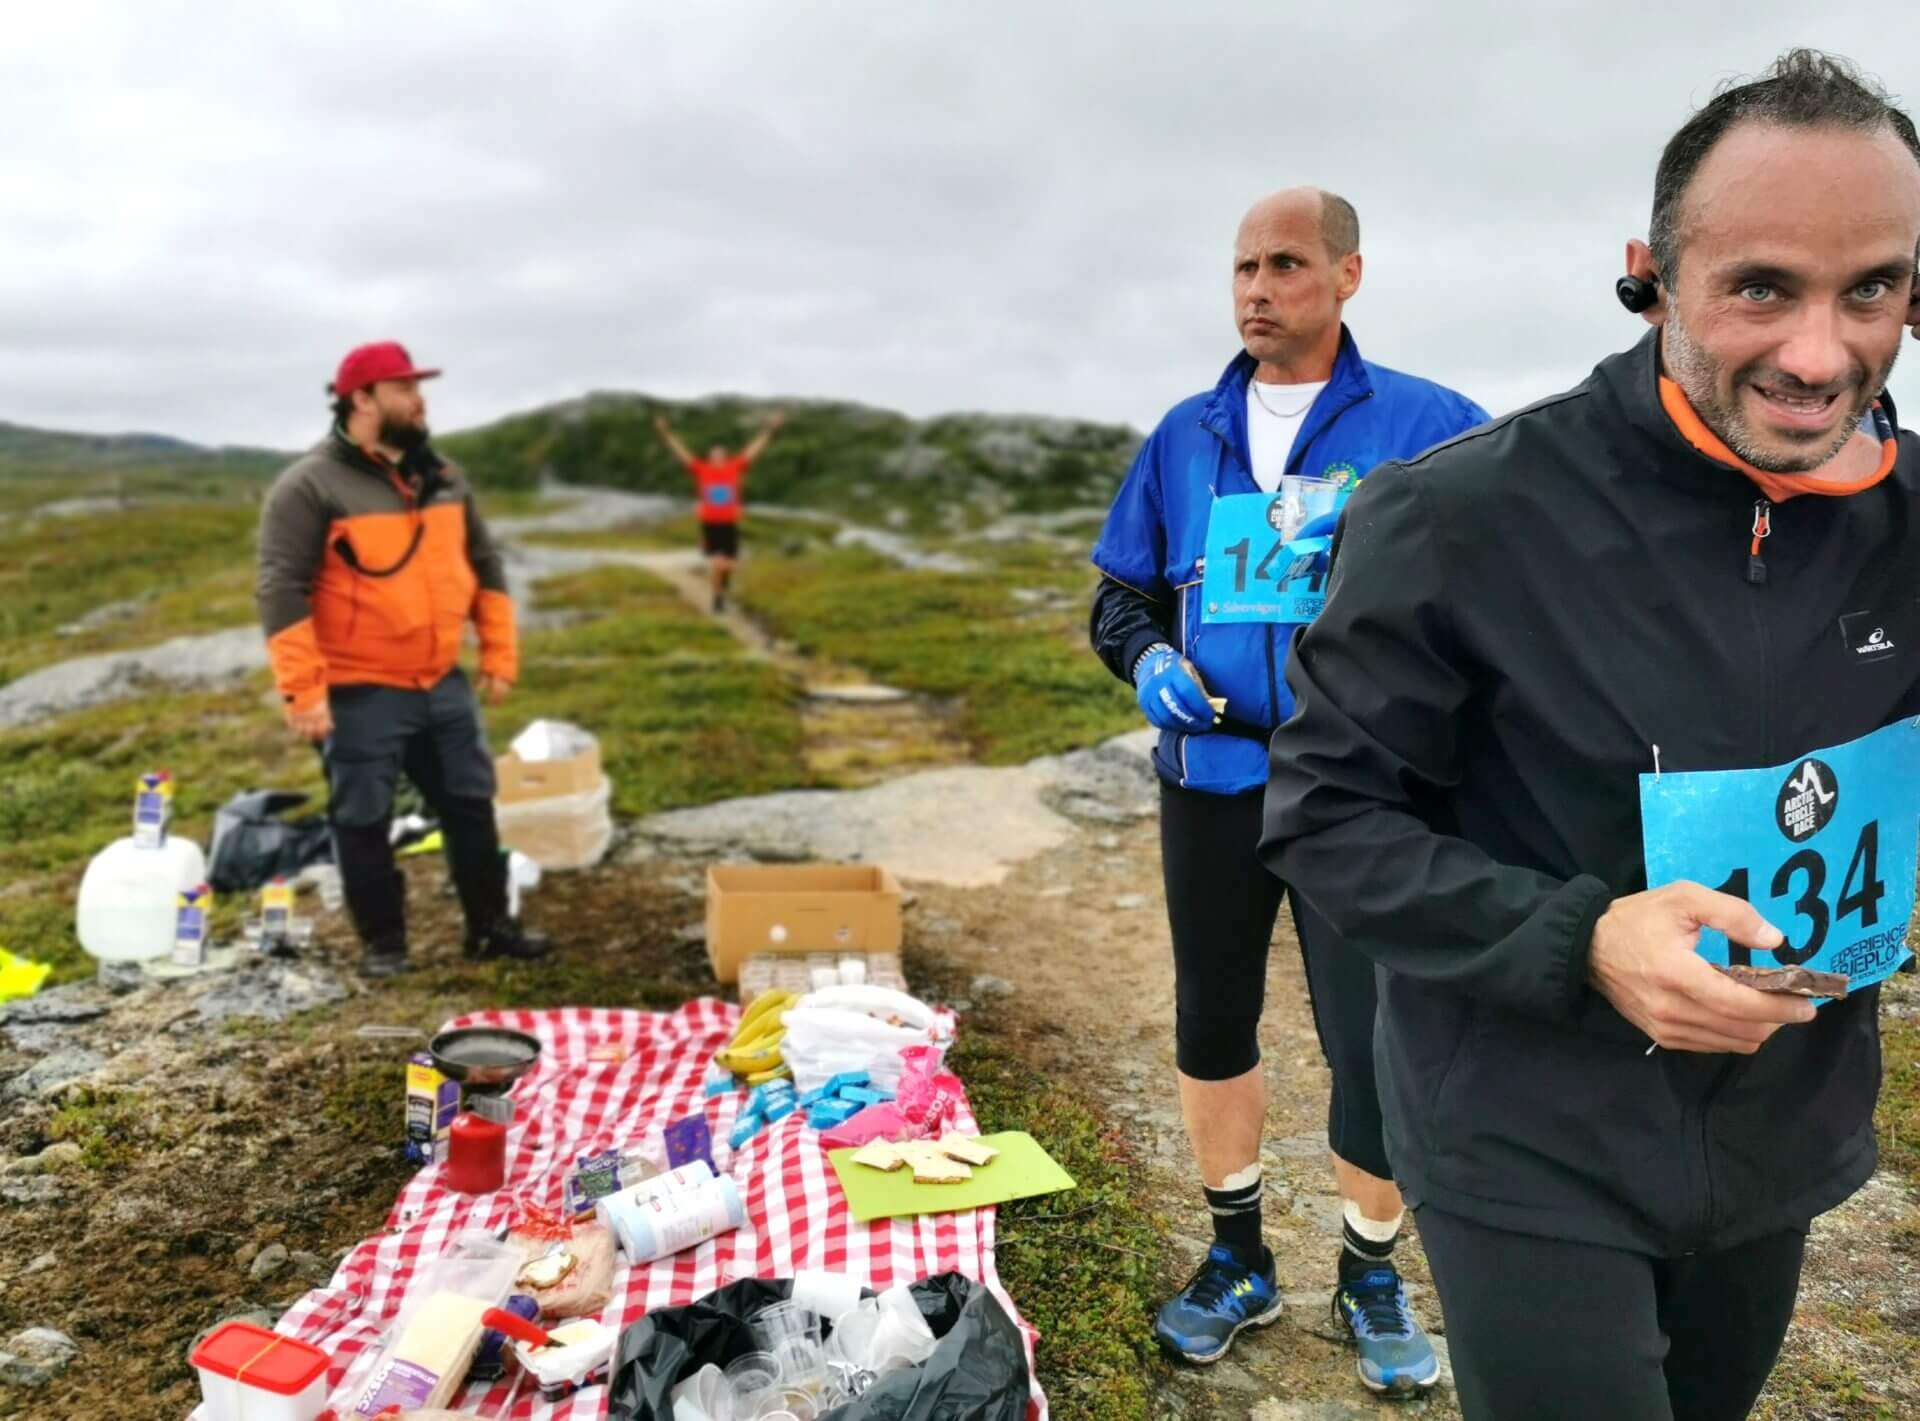 Arctic Circle Race 2019 Polcirkelloppet Guijaure kontr nr 134